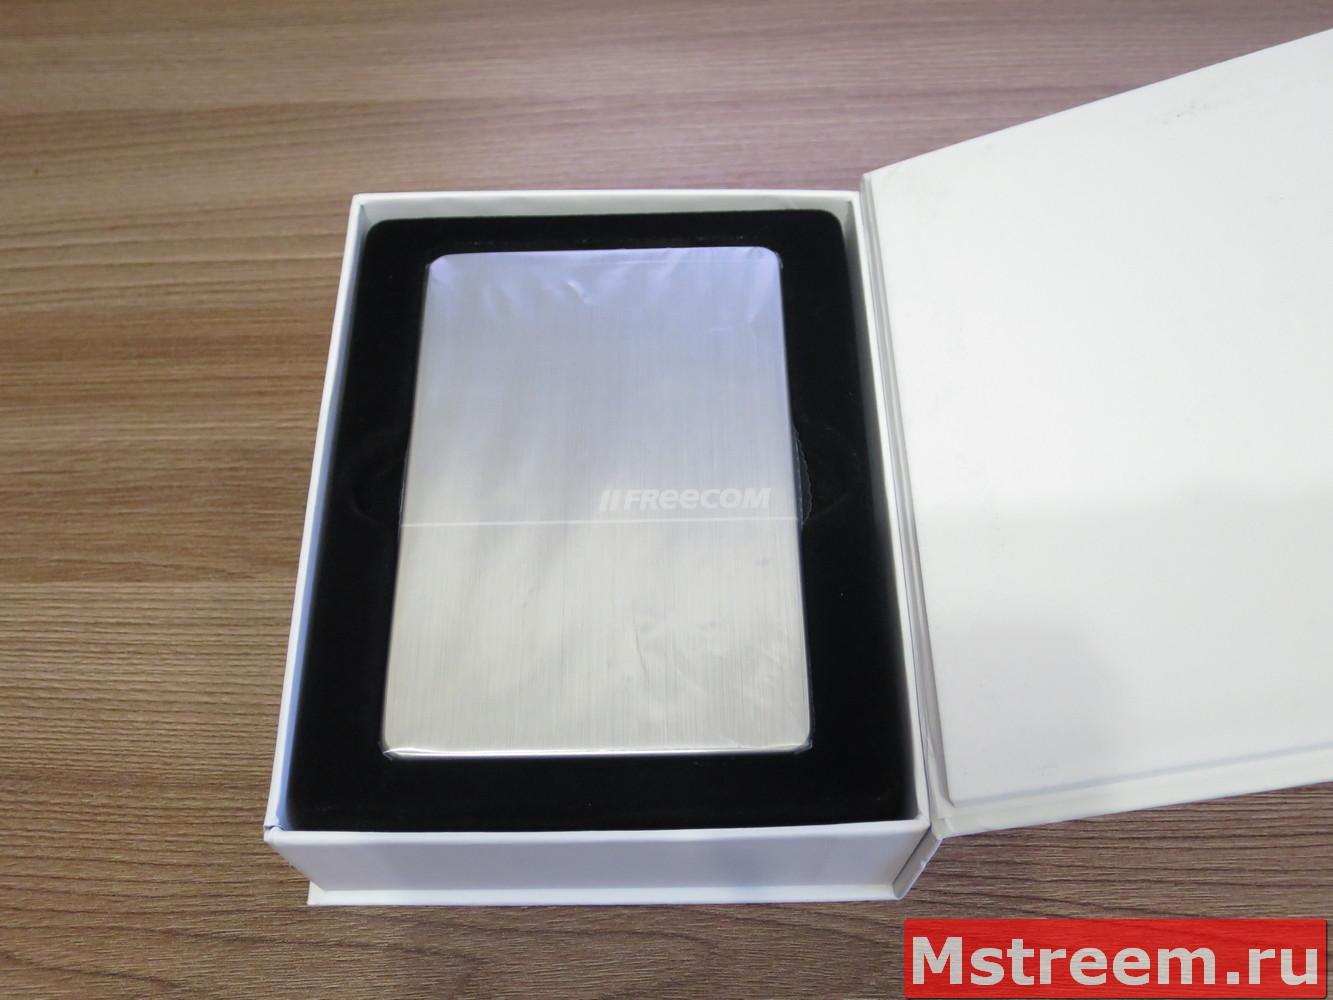 Упаковка внешнего жёсткого диска Freecom mHDD SLIM